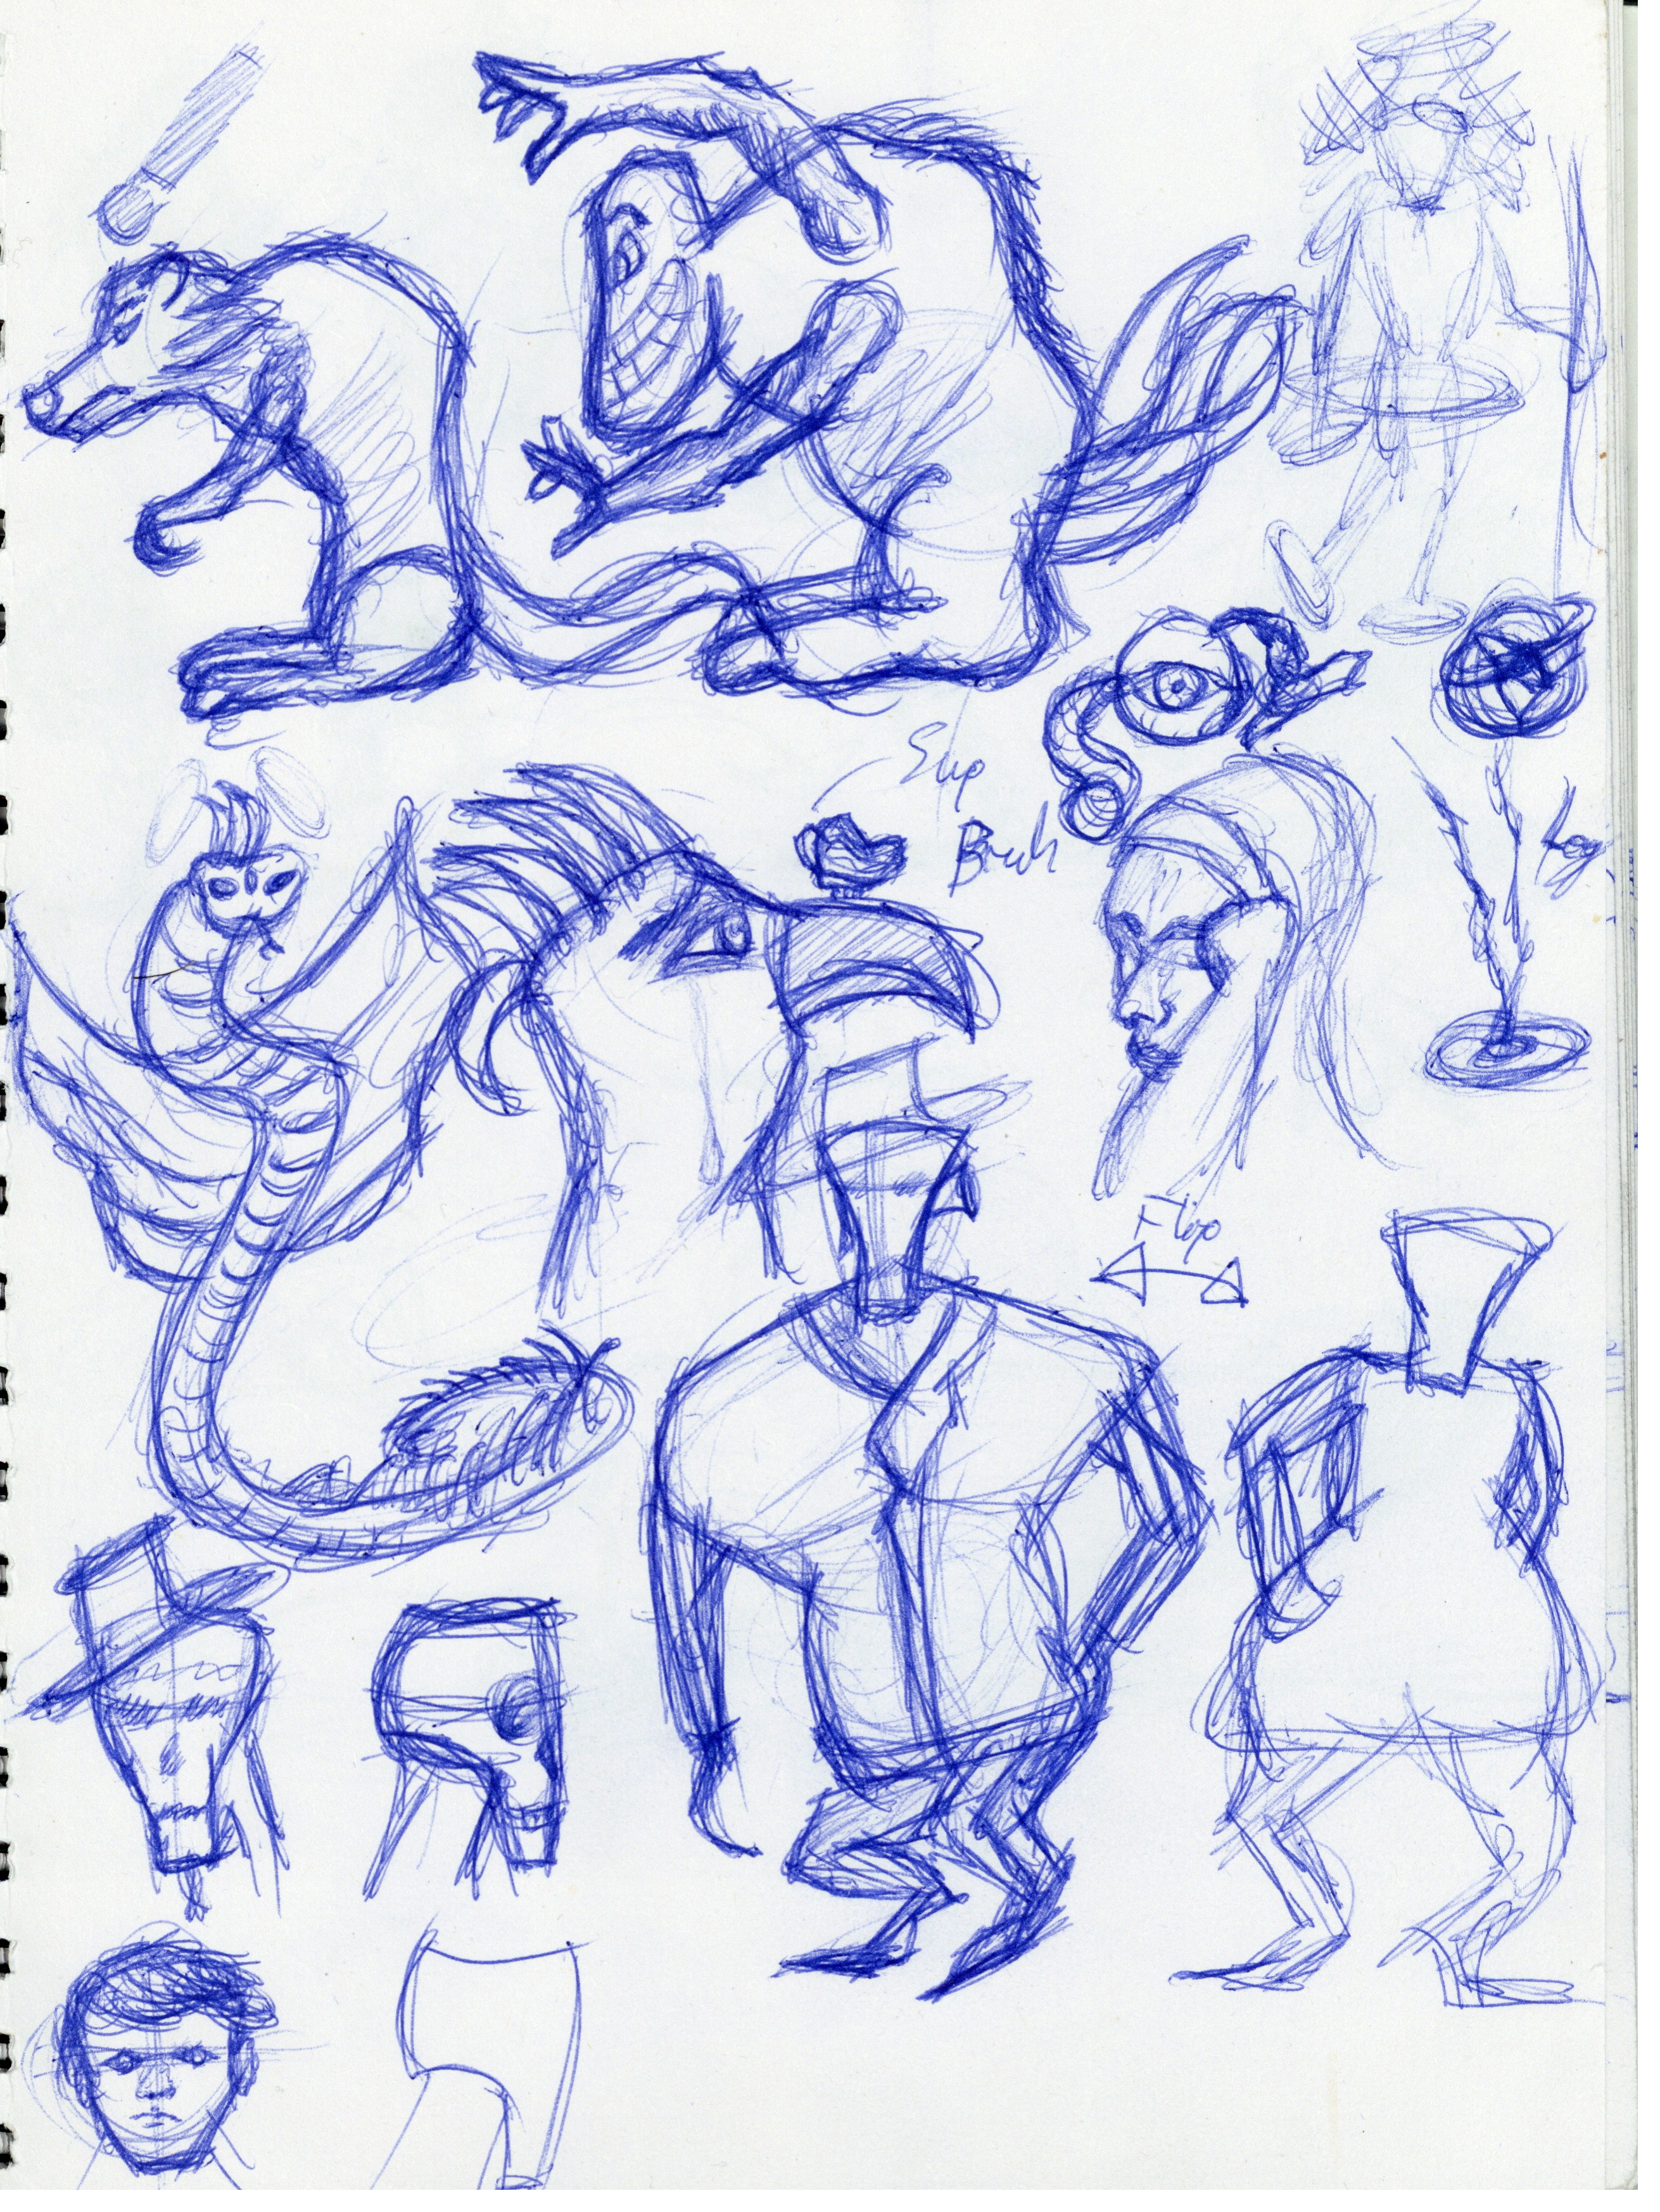 Character-Creature Doodles